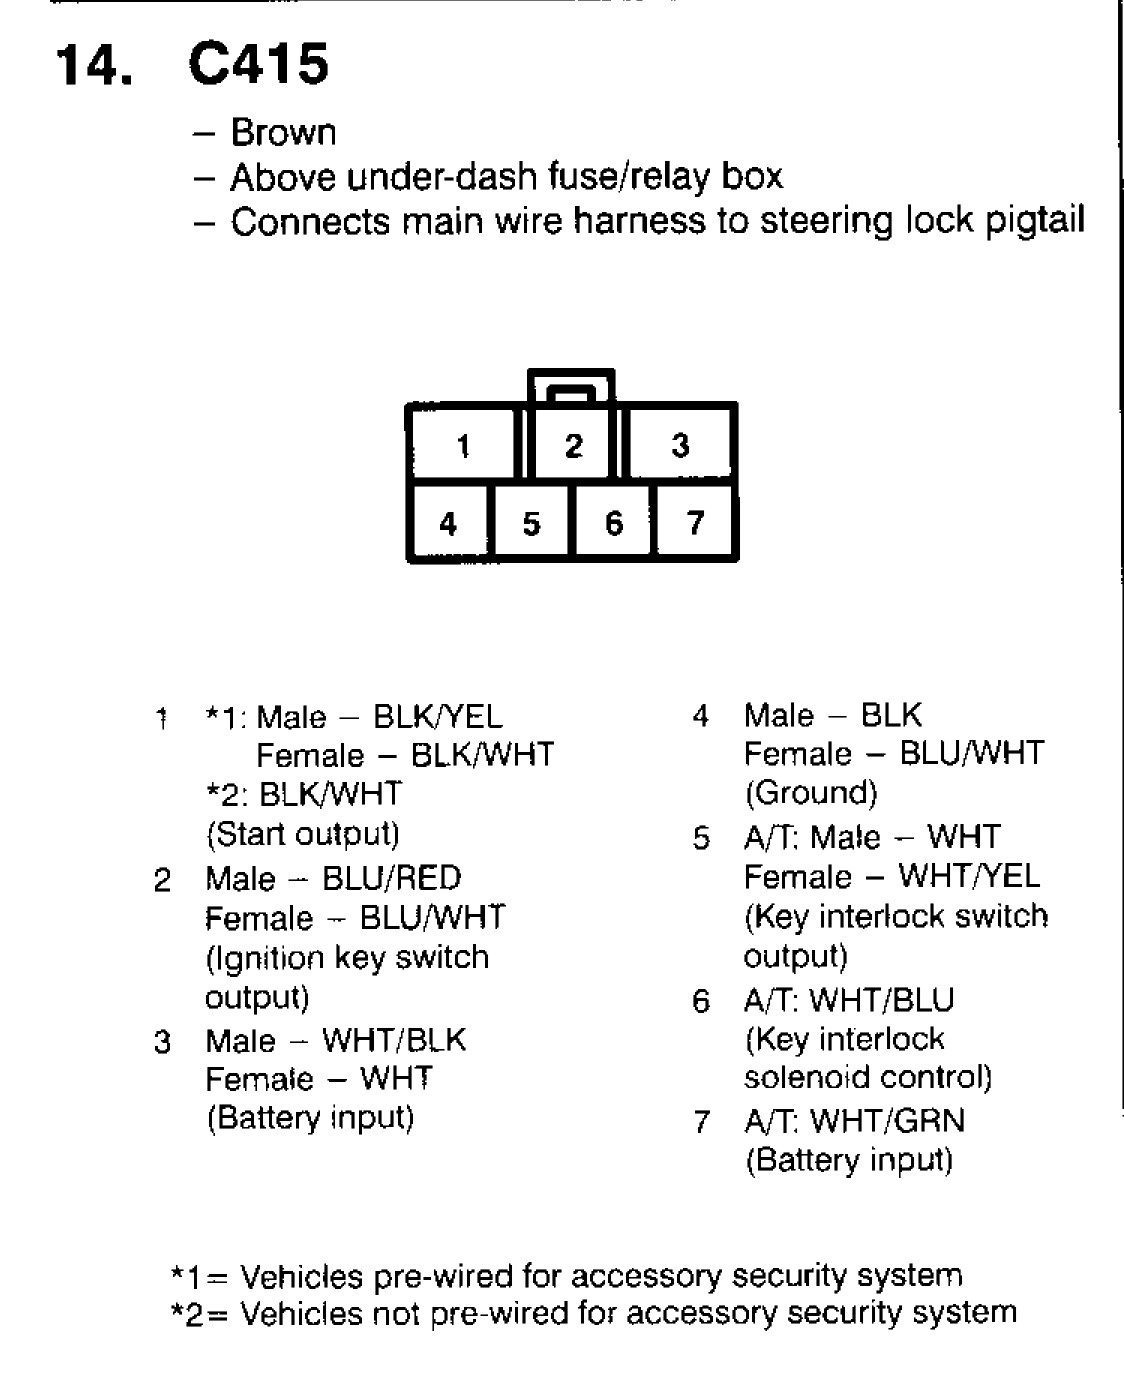 beeping from fuse box - center wiring diagram link-detail -  link-detail.iosonointersex.it  iosonointersex.it